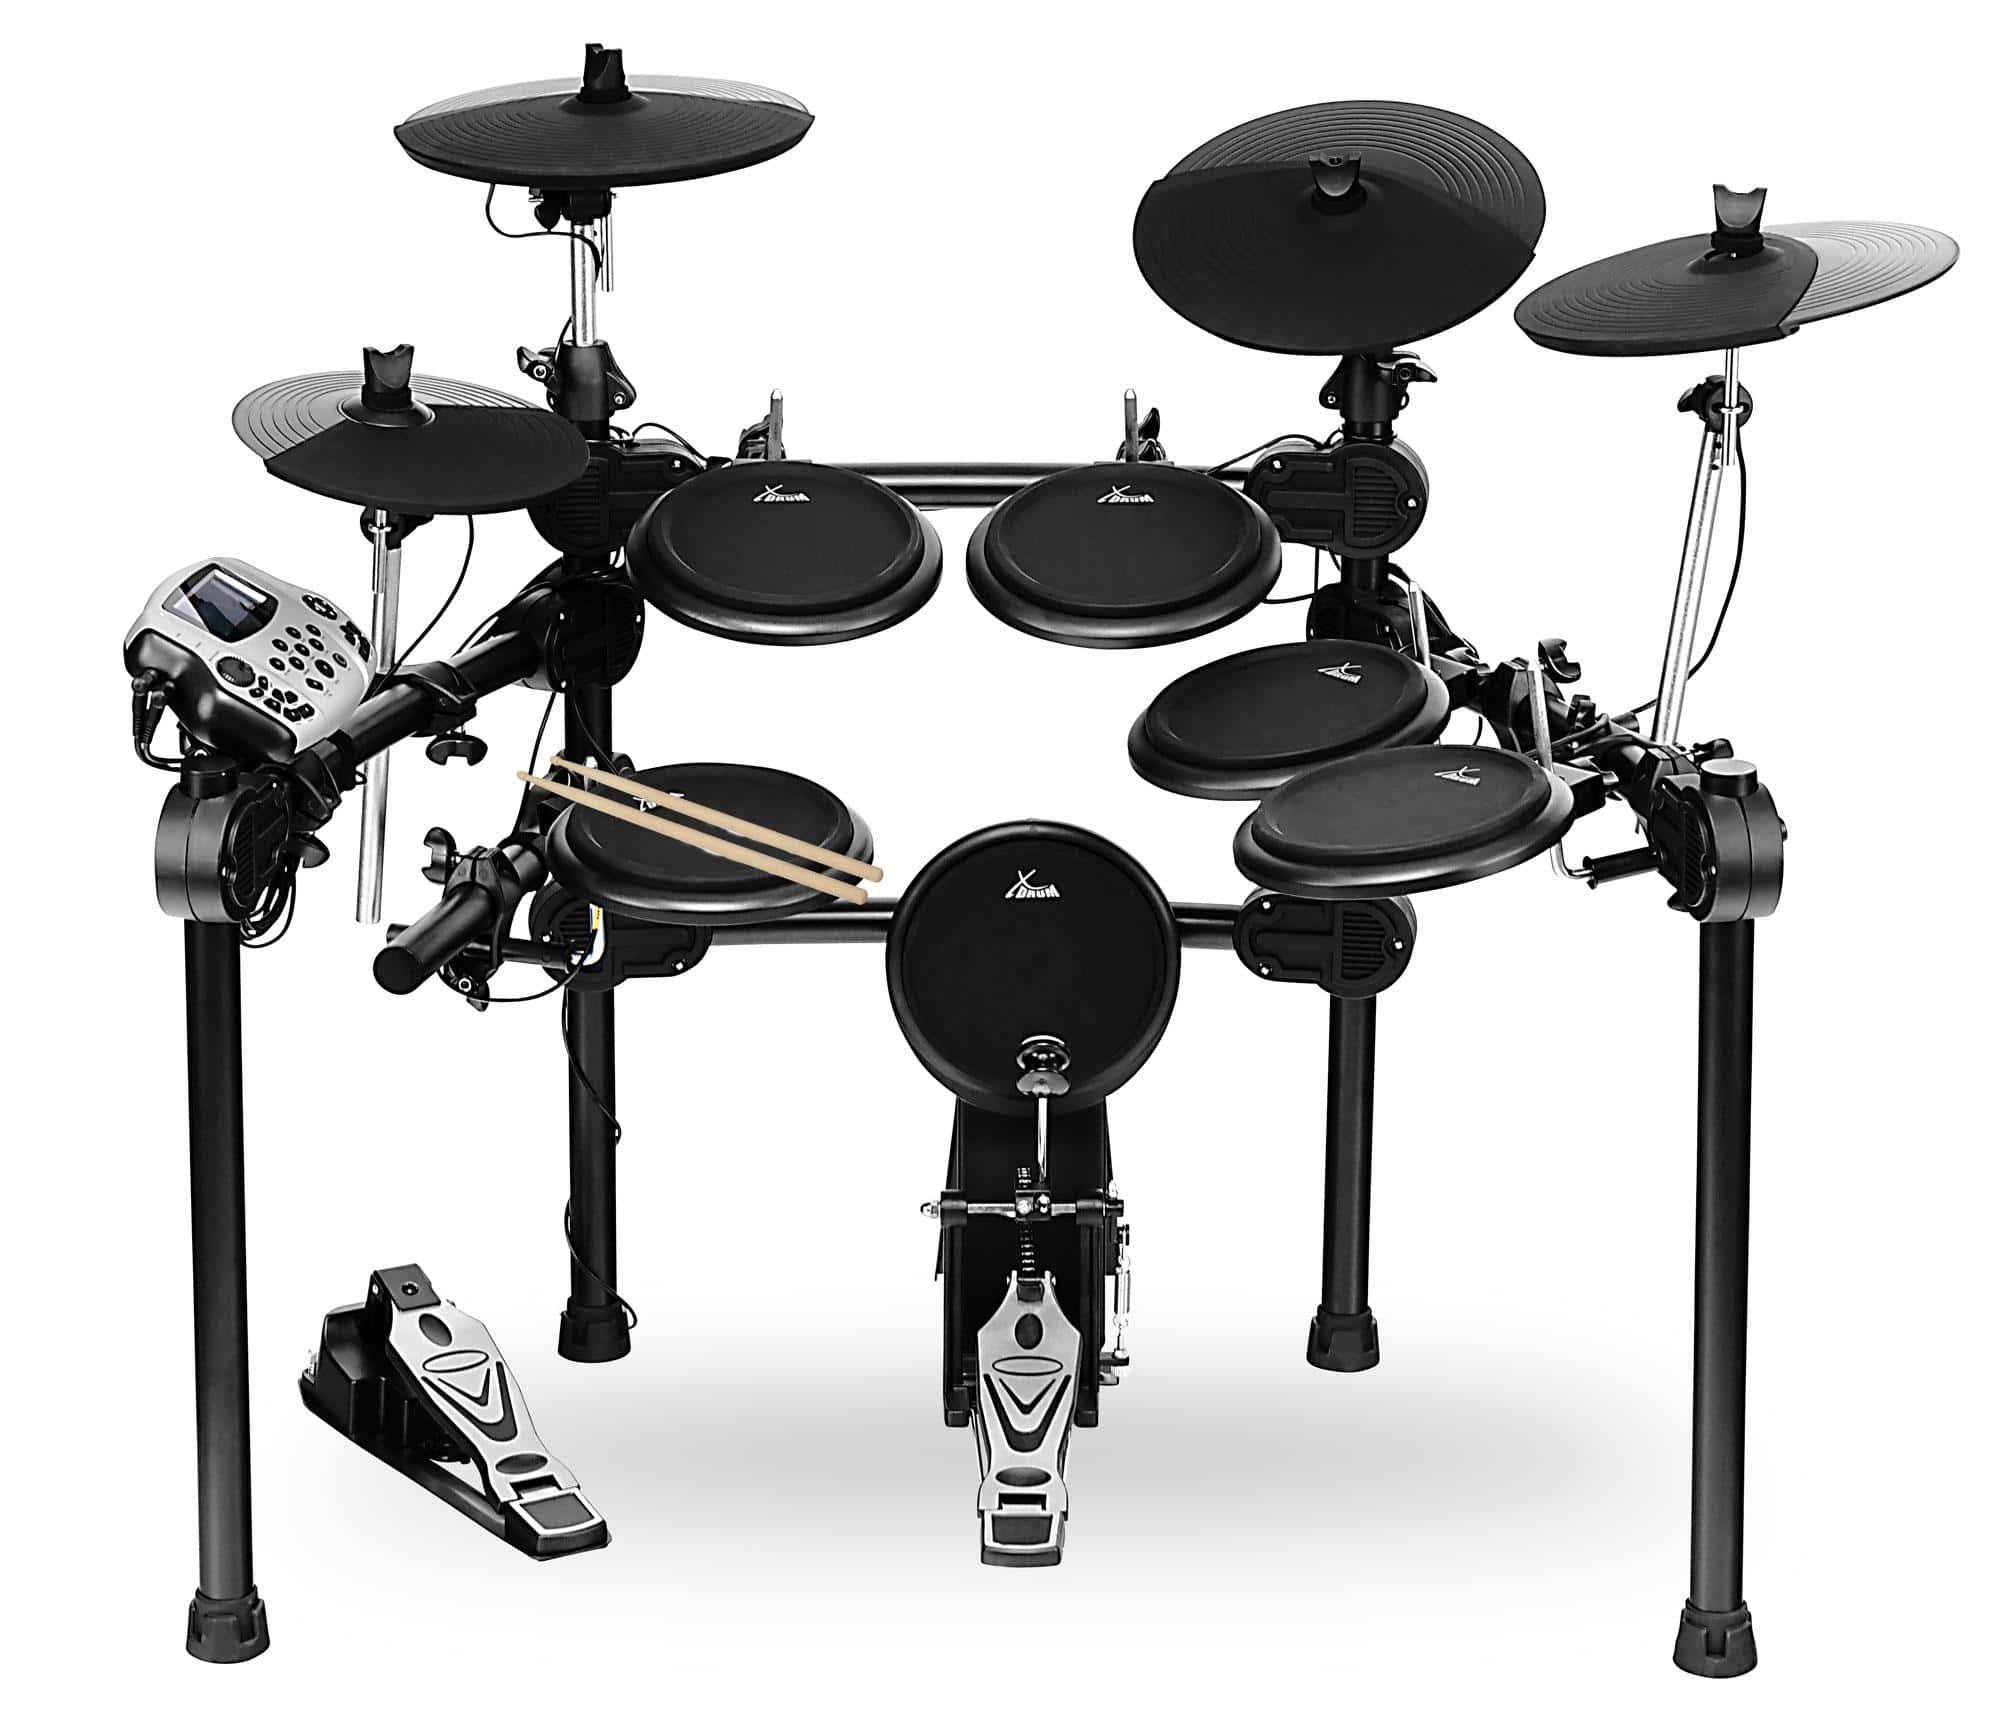 XDrum DD 520 PLUS E Drum Kit